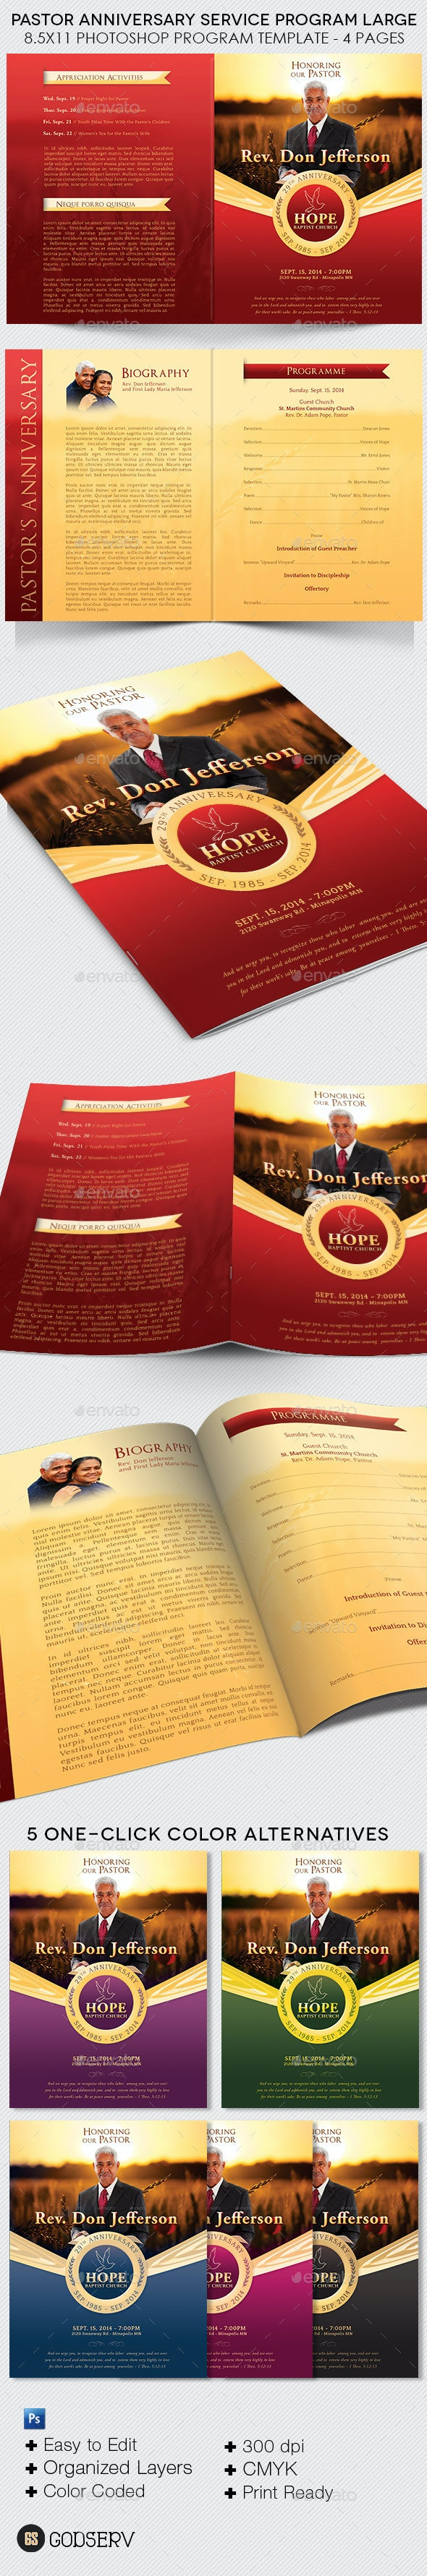 Pastor Anniversary Service Program Large Template - Informational Brochures